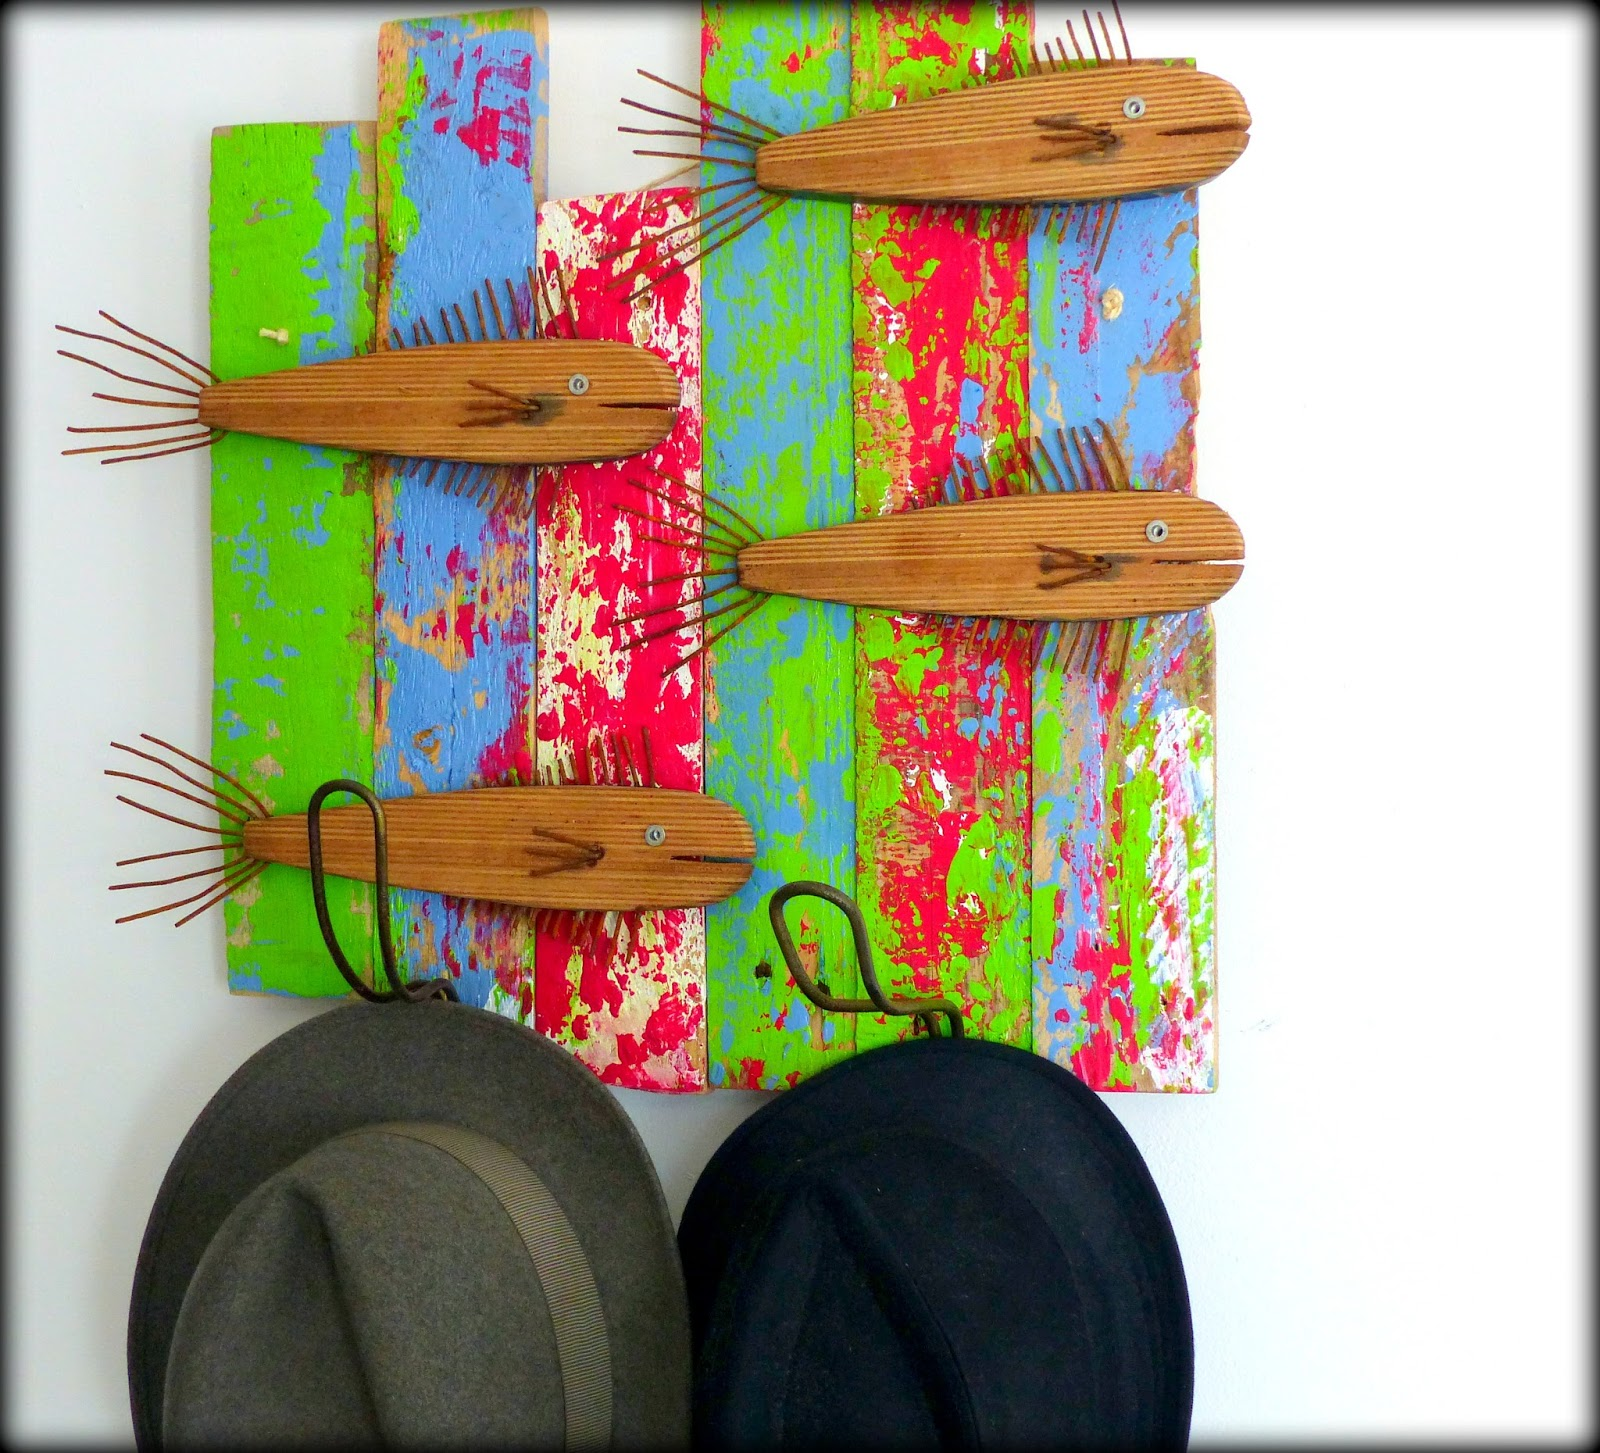 art d co cr ation en bois flott et m tal mutoz inc art en bois flott. Black Bedroom Furniture Sets. Home Design Ideas